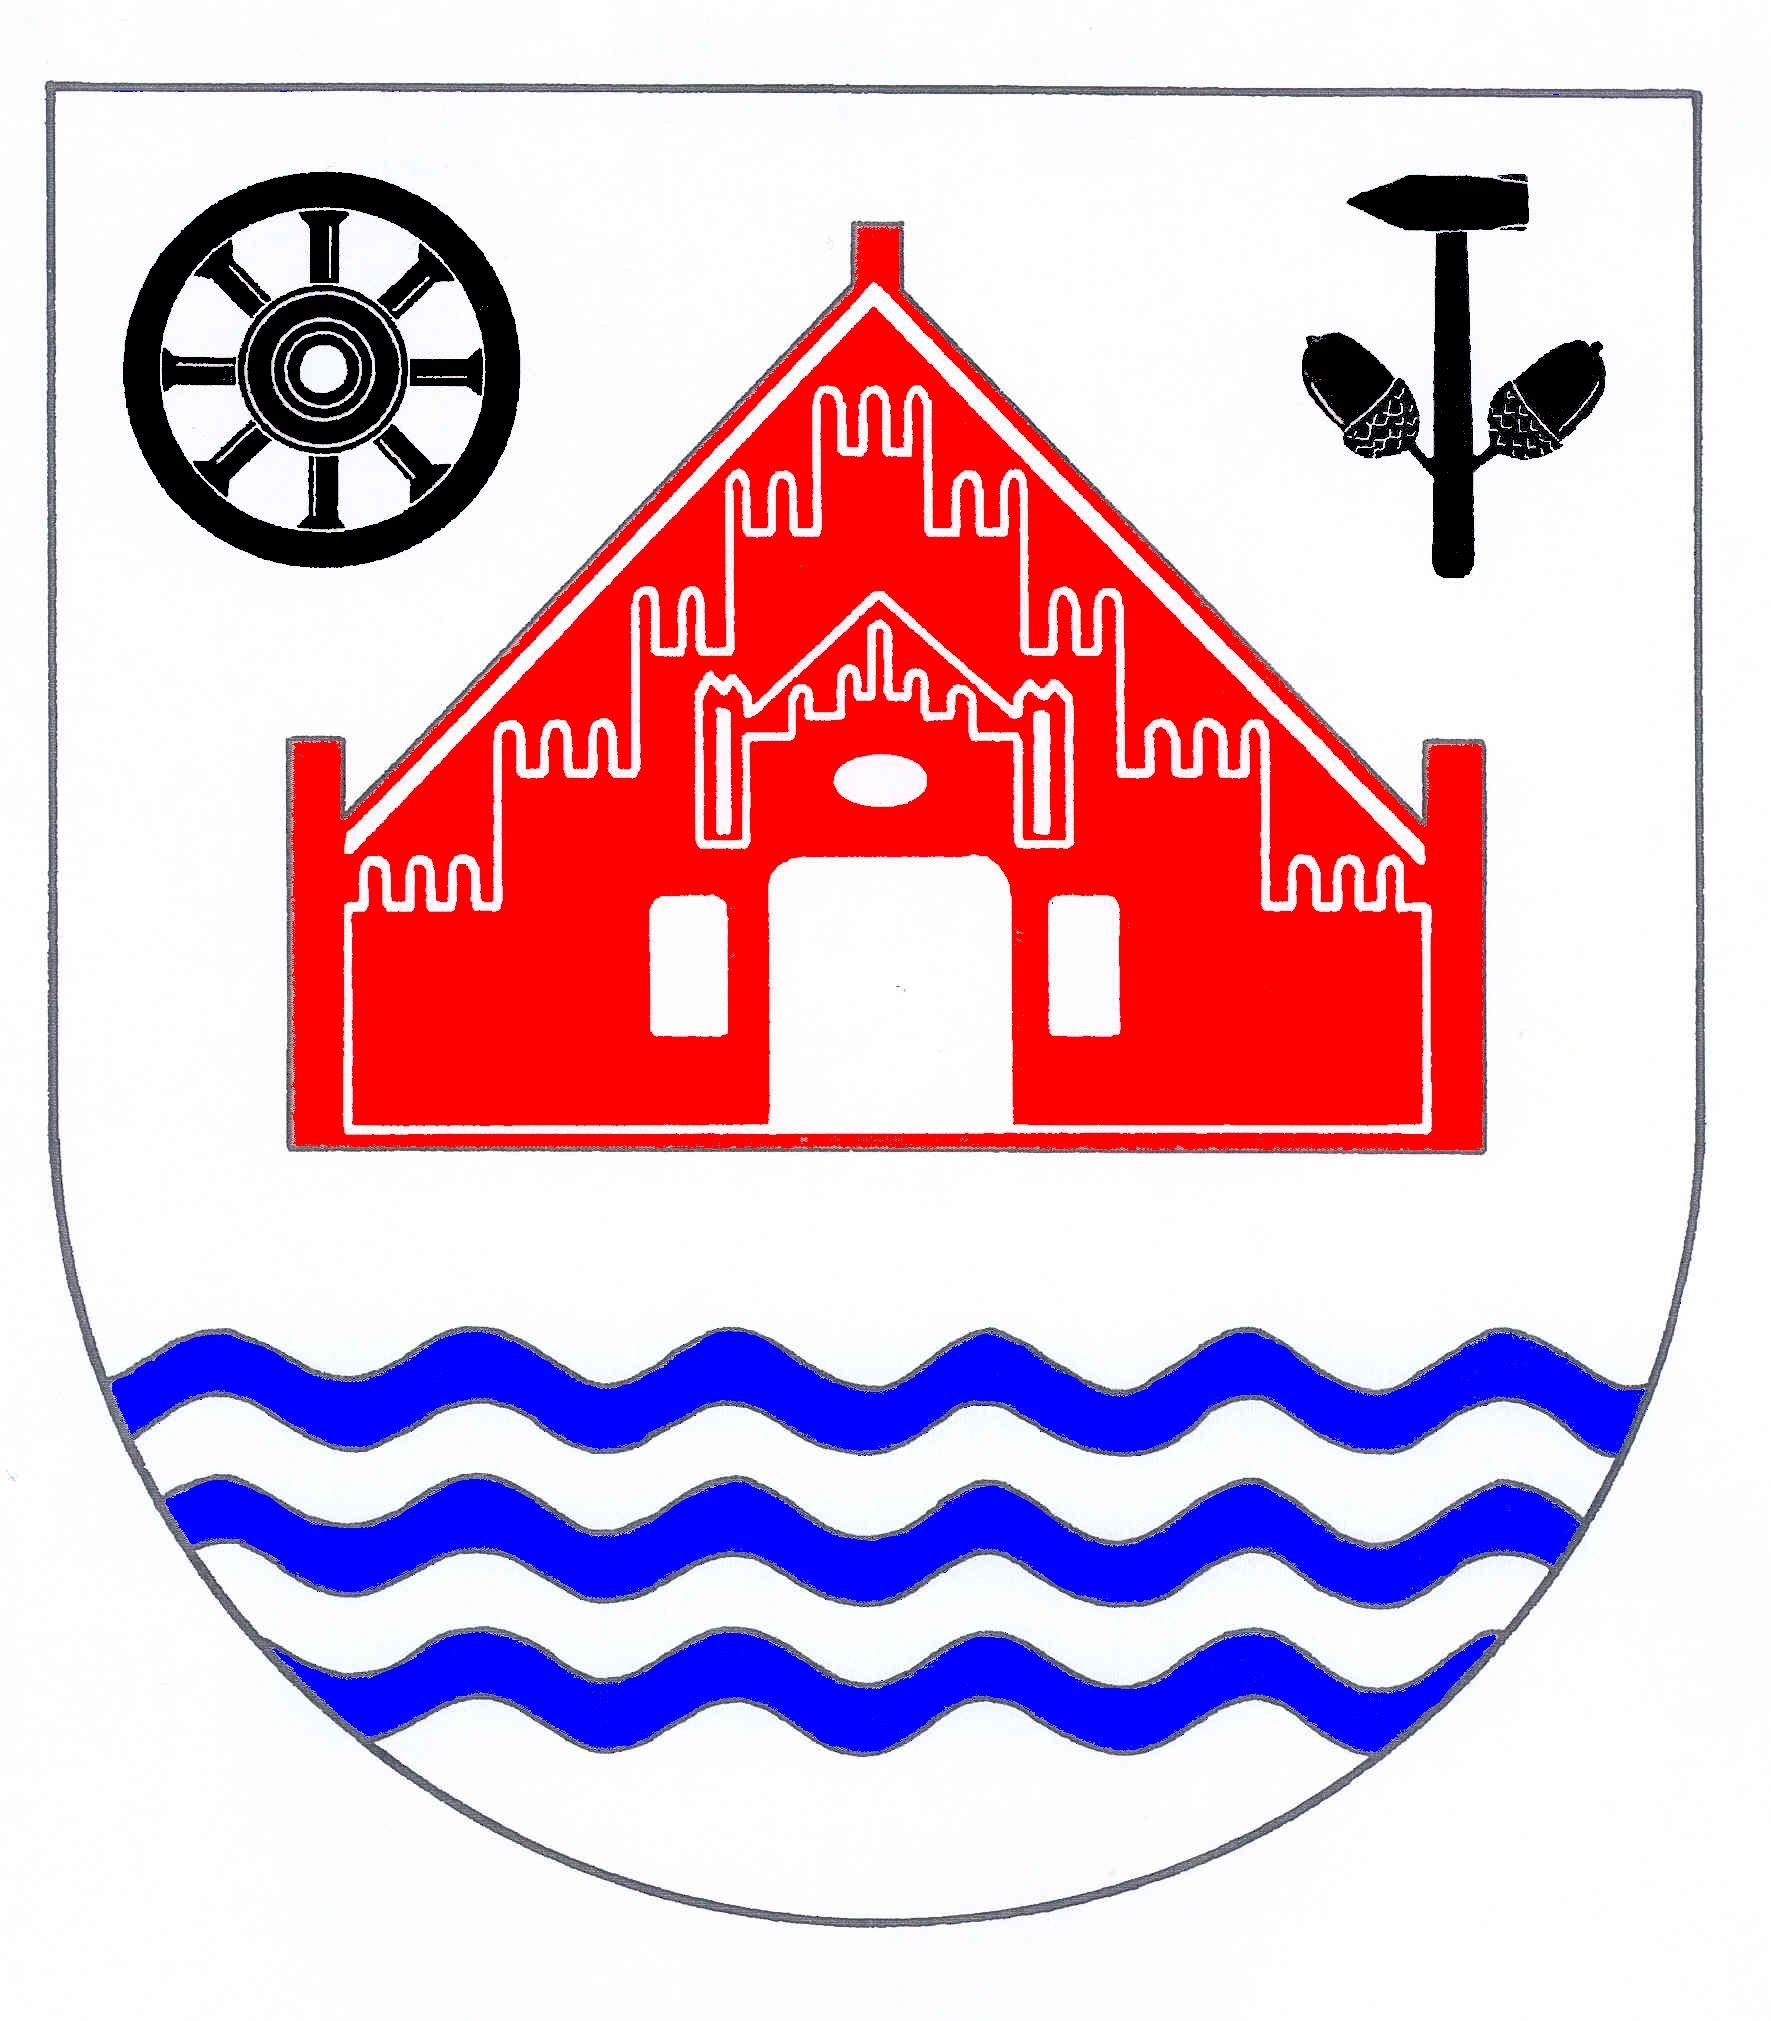 Wappen GemeindeHöhndorf, Kreis Plön